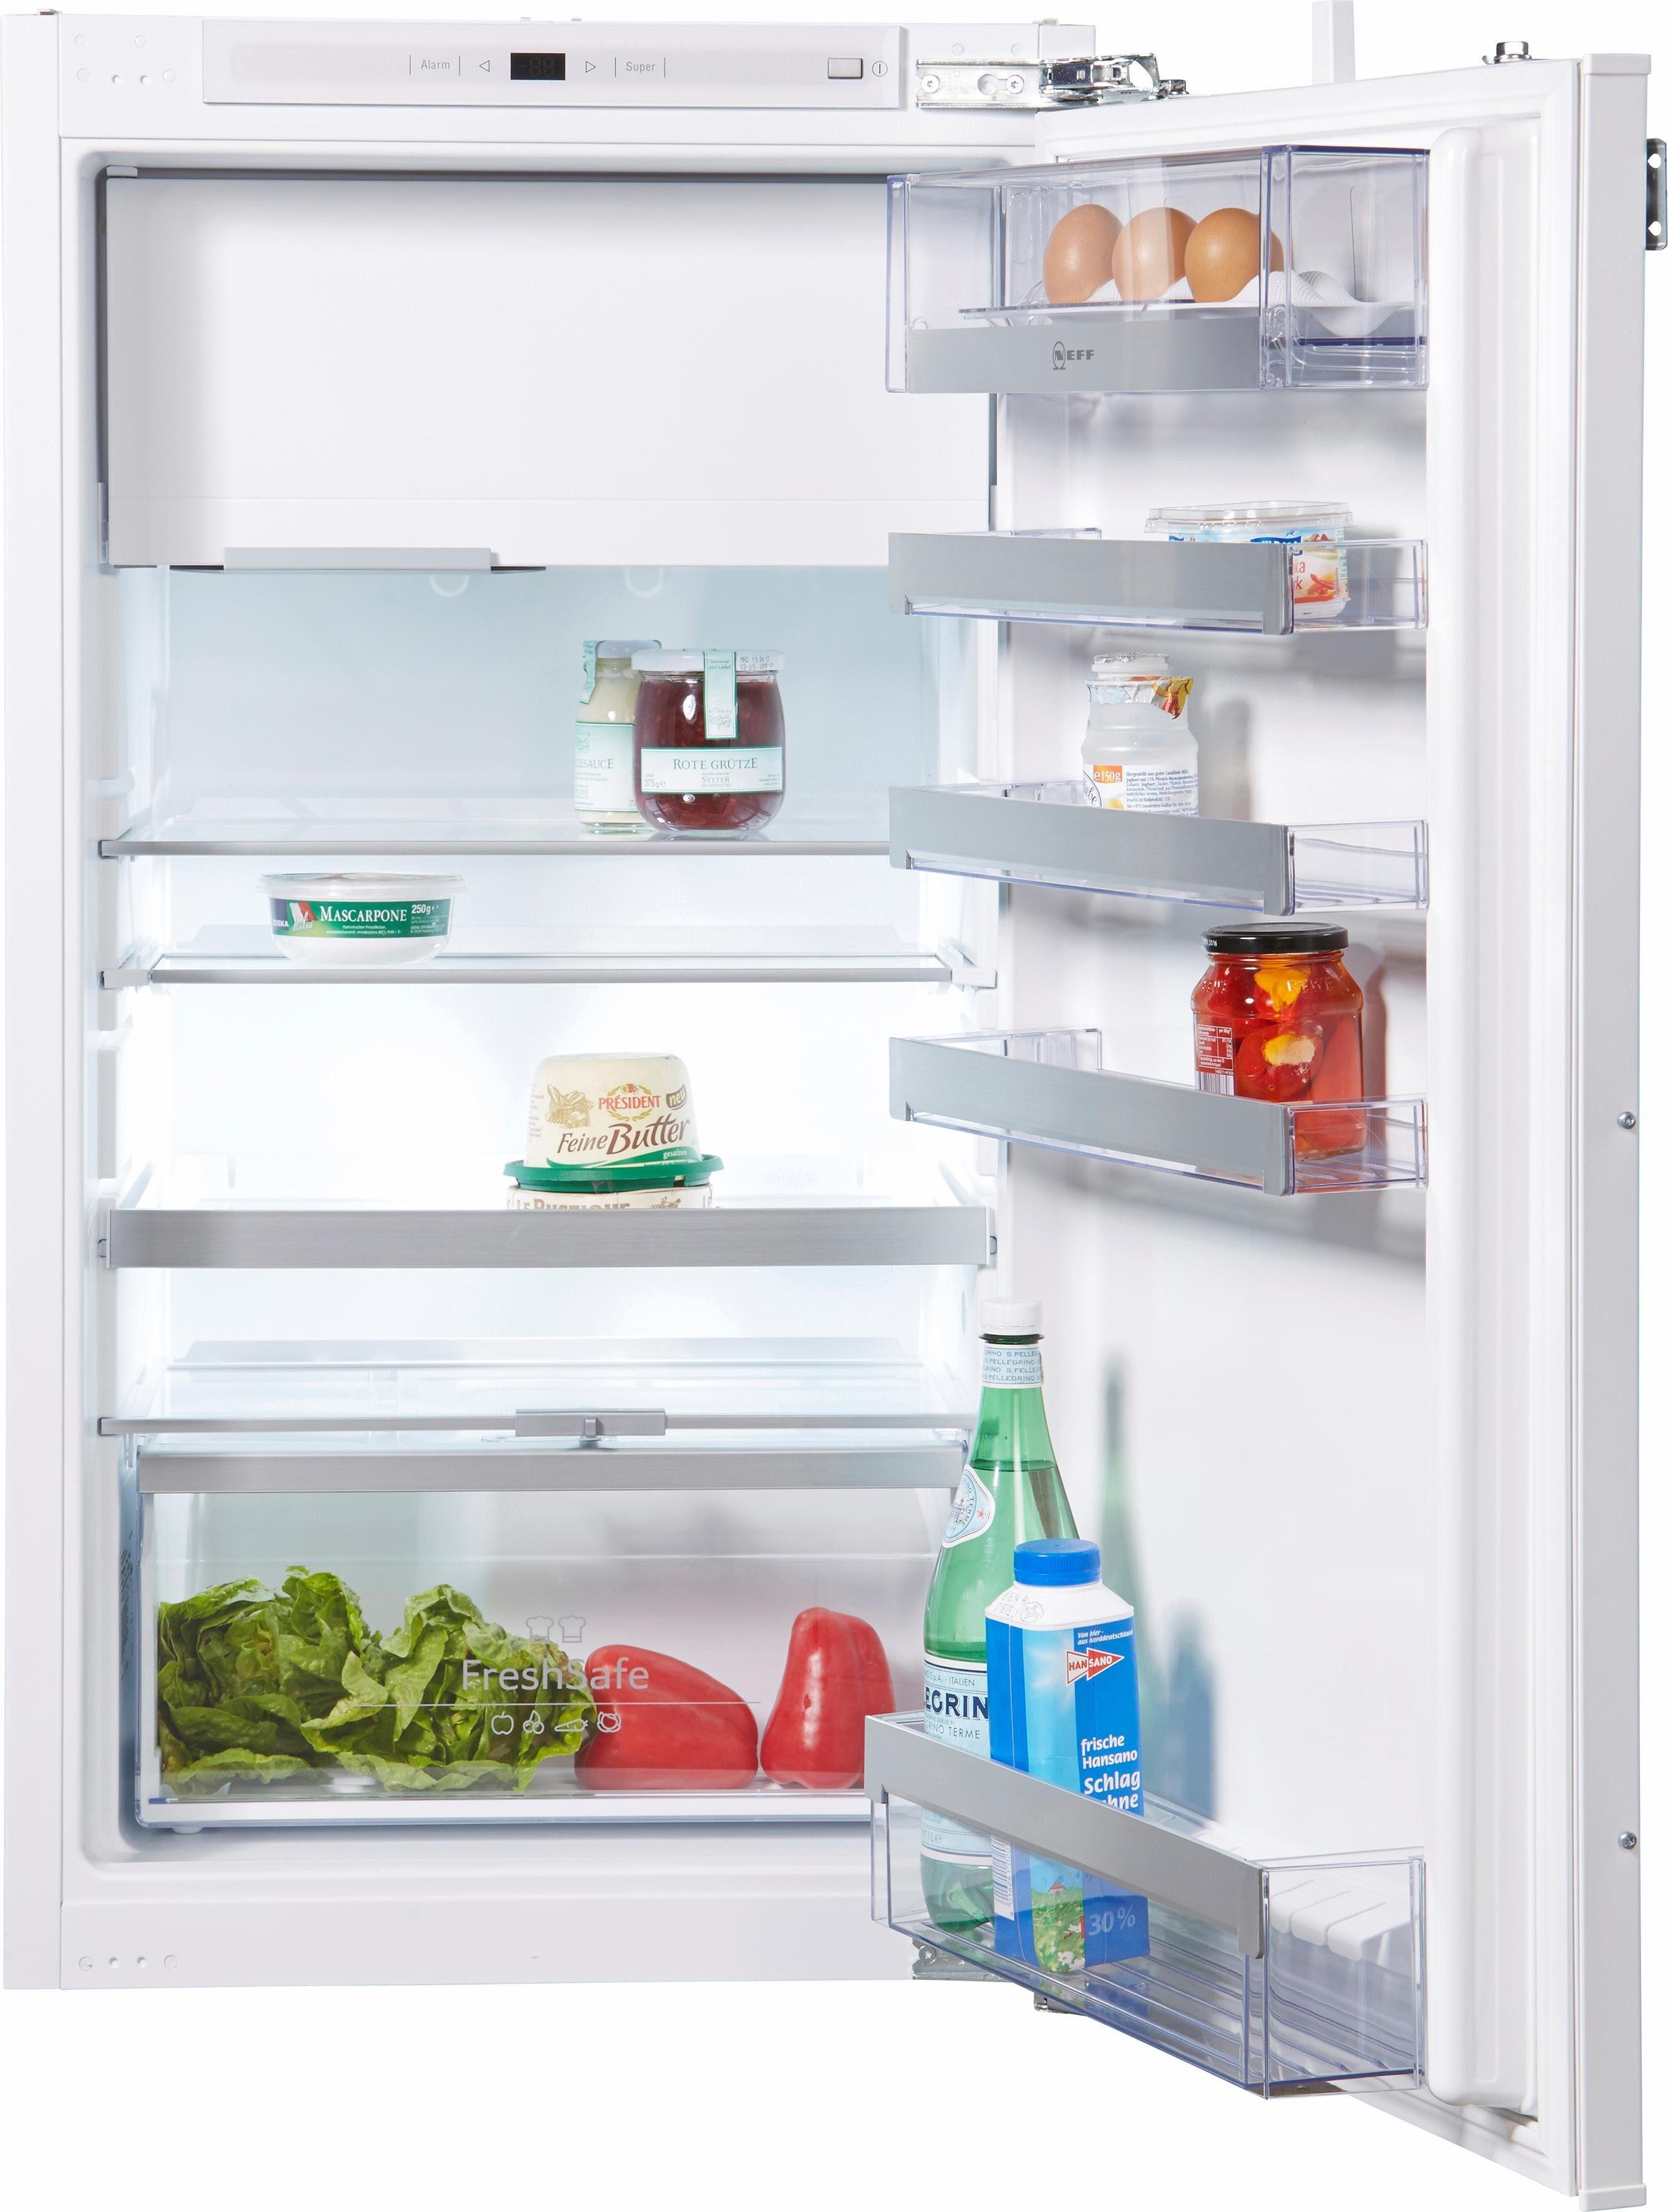 NEFF Einbaukühlschrank K346A3 / KI2323D40, 102,1 cm hoch, 55,8 cm breit, integrierbar